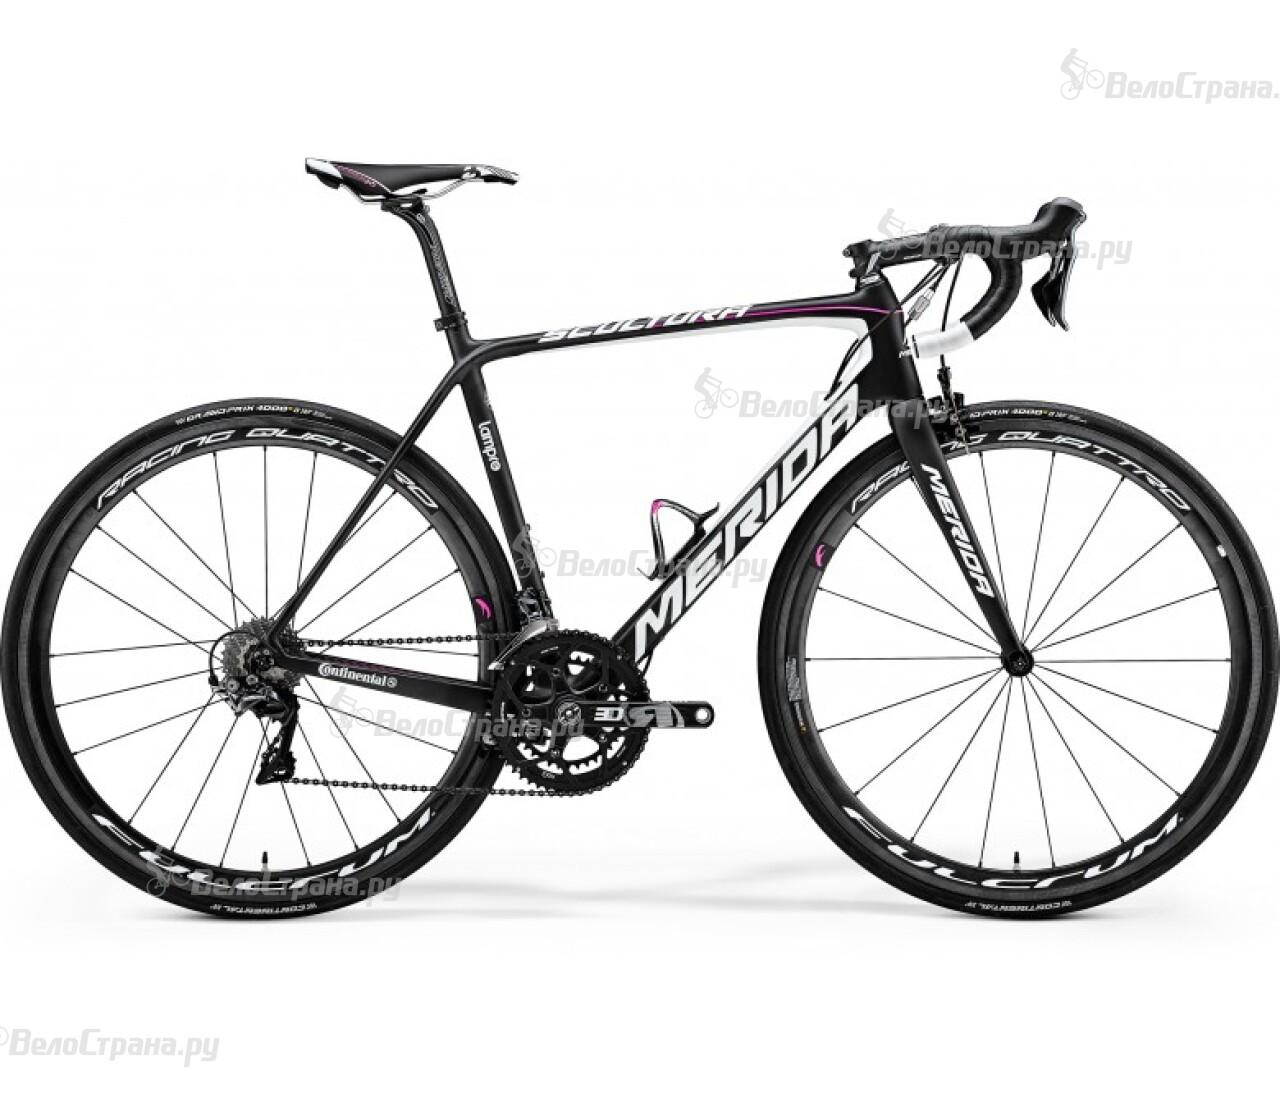 Велосипед Merida Scultura Team (2017) велосипед merida scultura 9000 2015